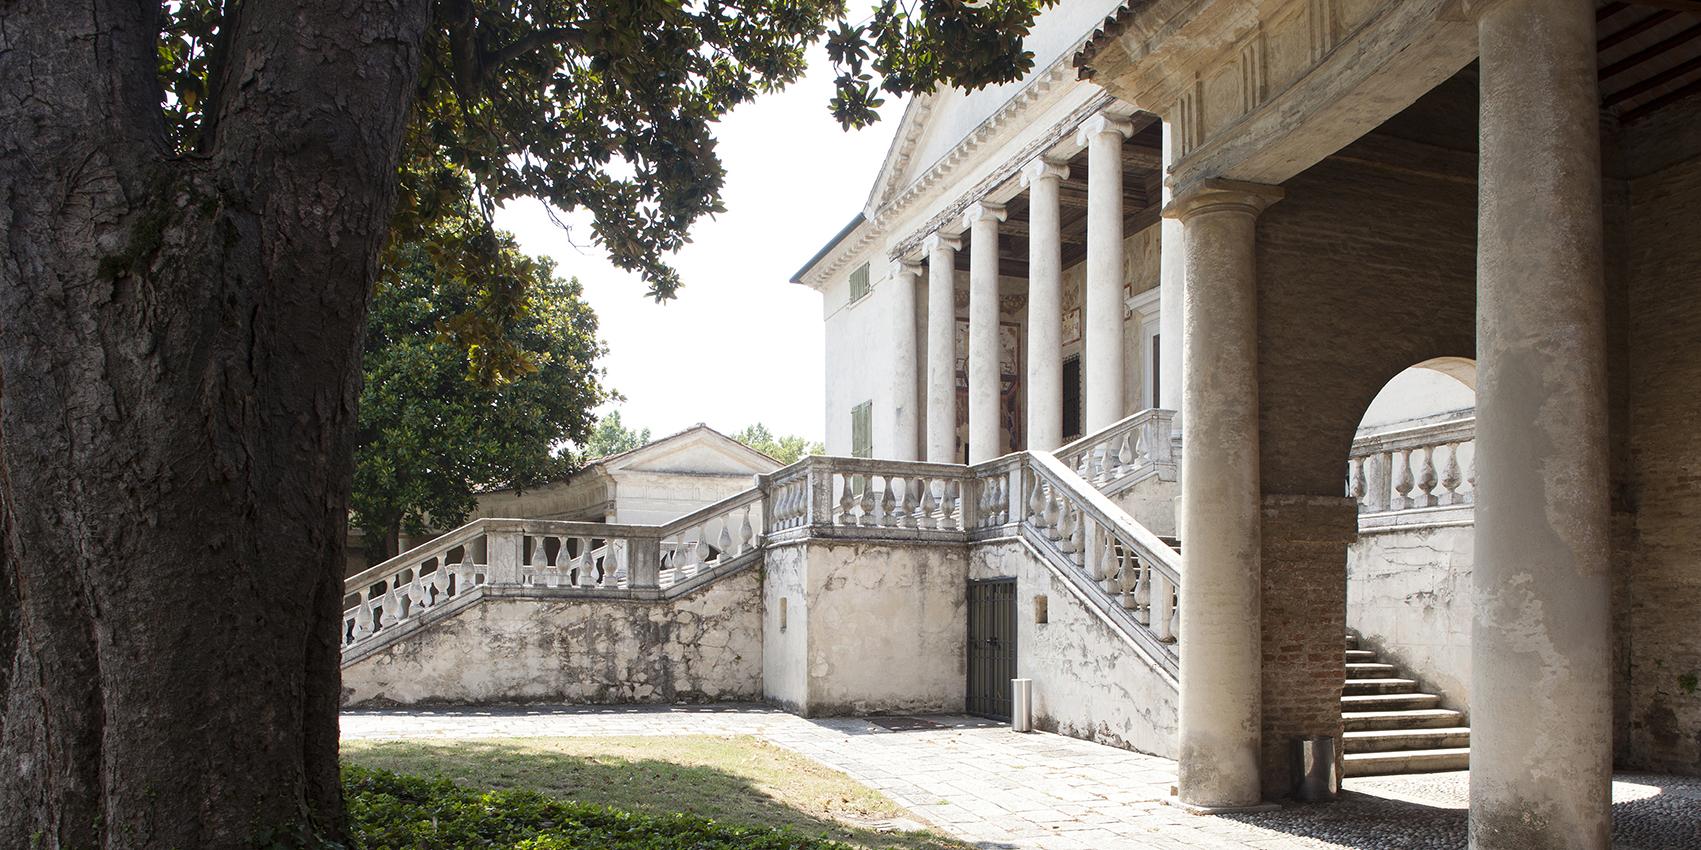 Villa Badoer, detail.